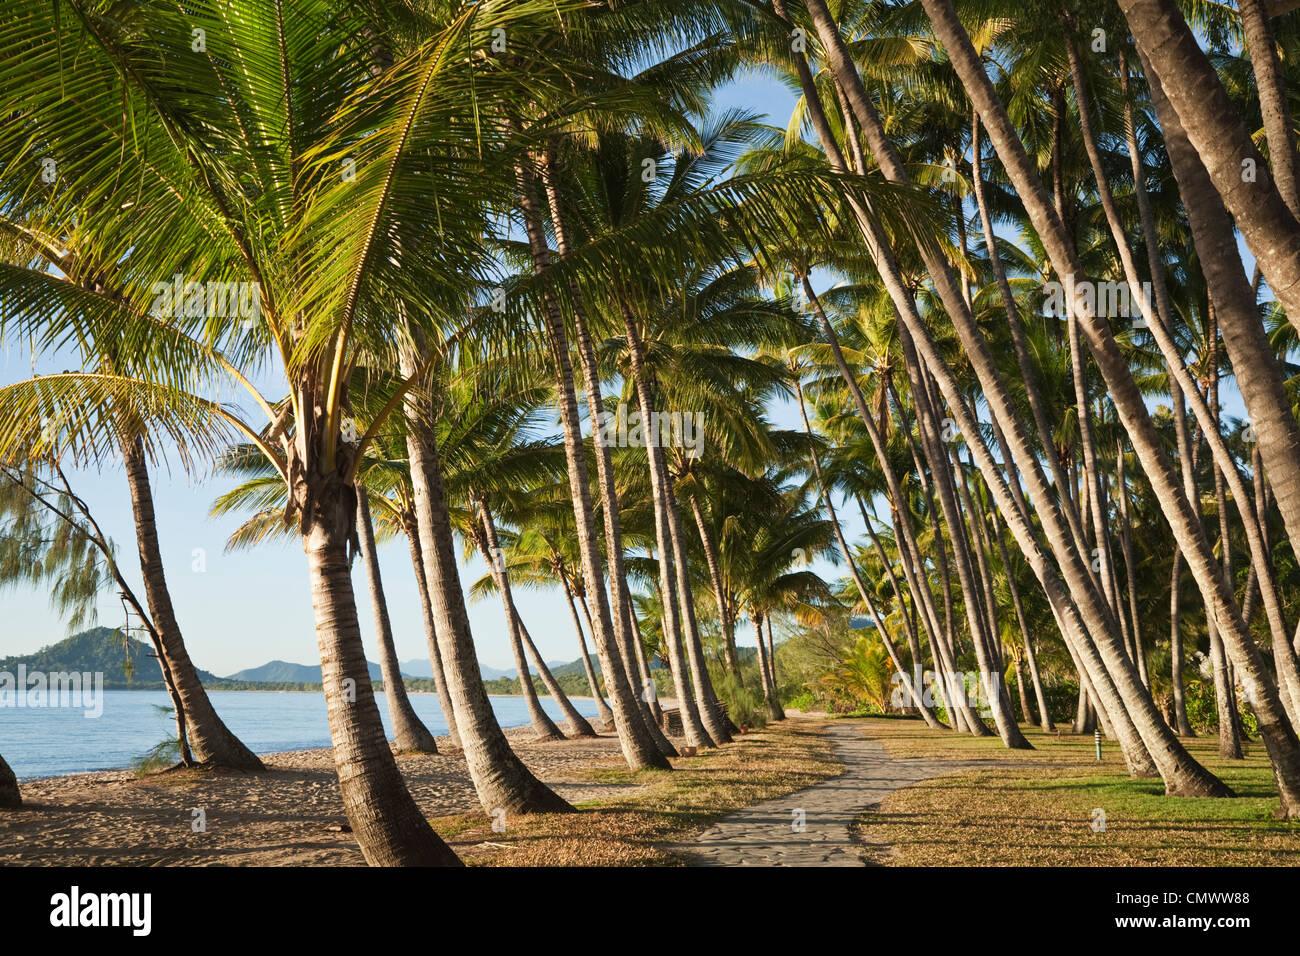 Kokos-Palmen am Strand von Palm Cove, Cairns, Queensland, Australien Stockbild